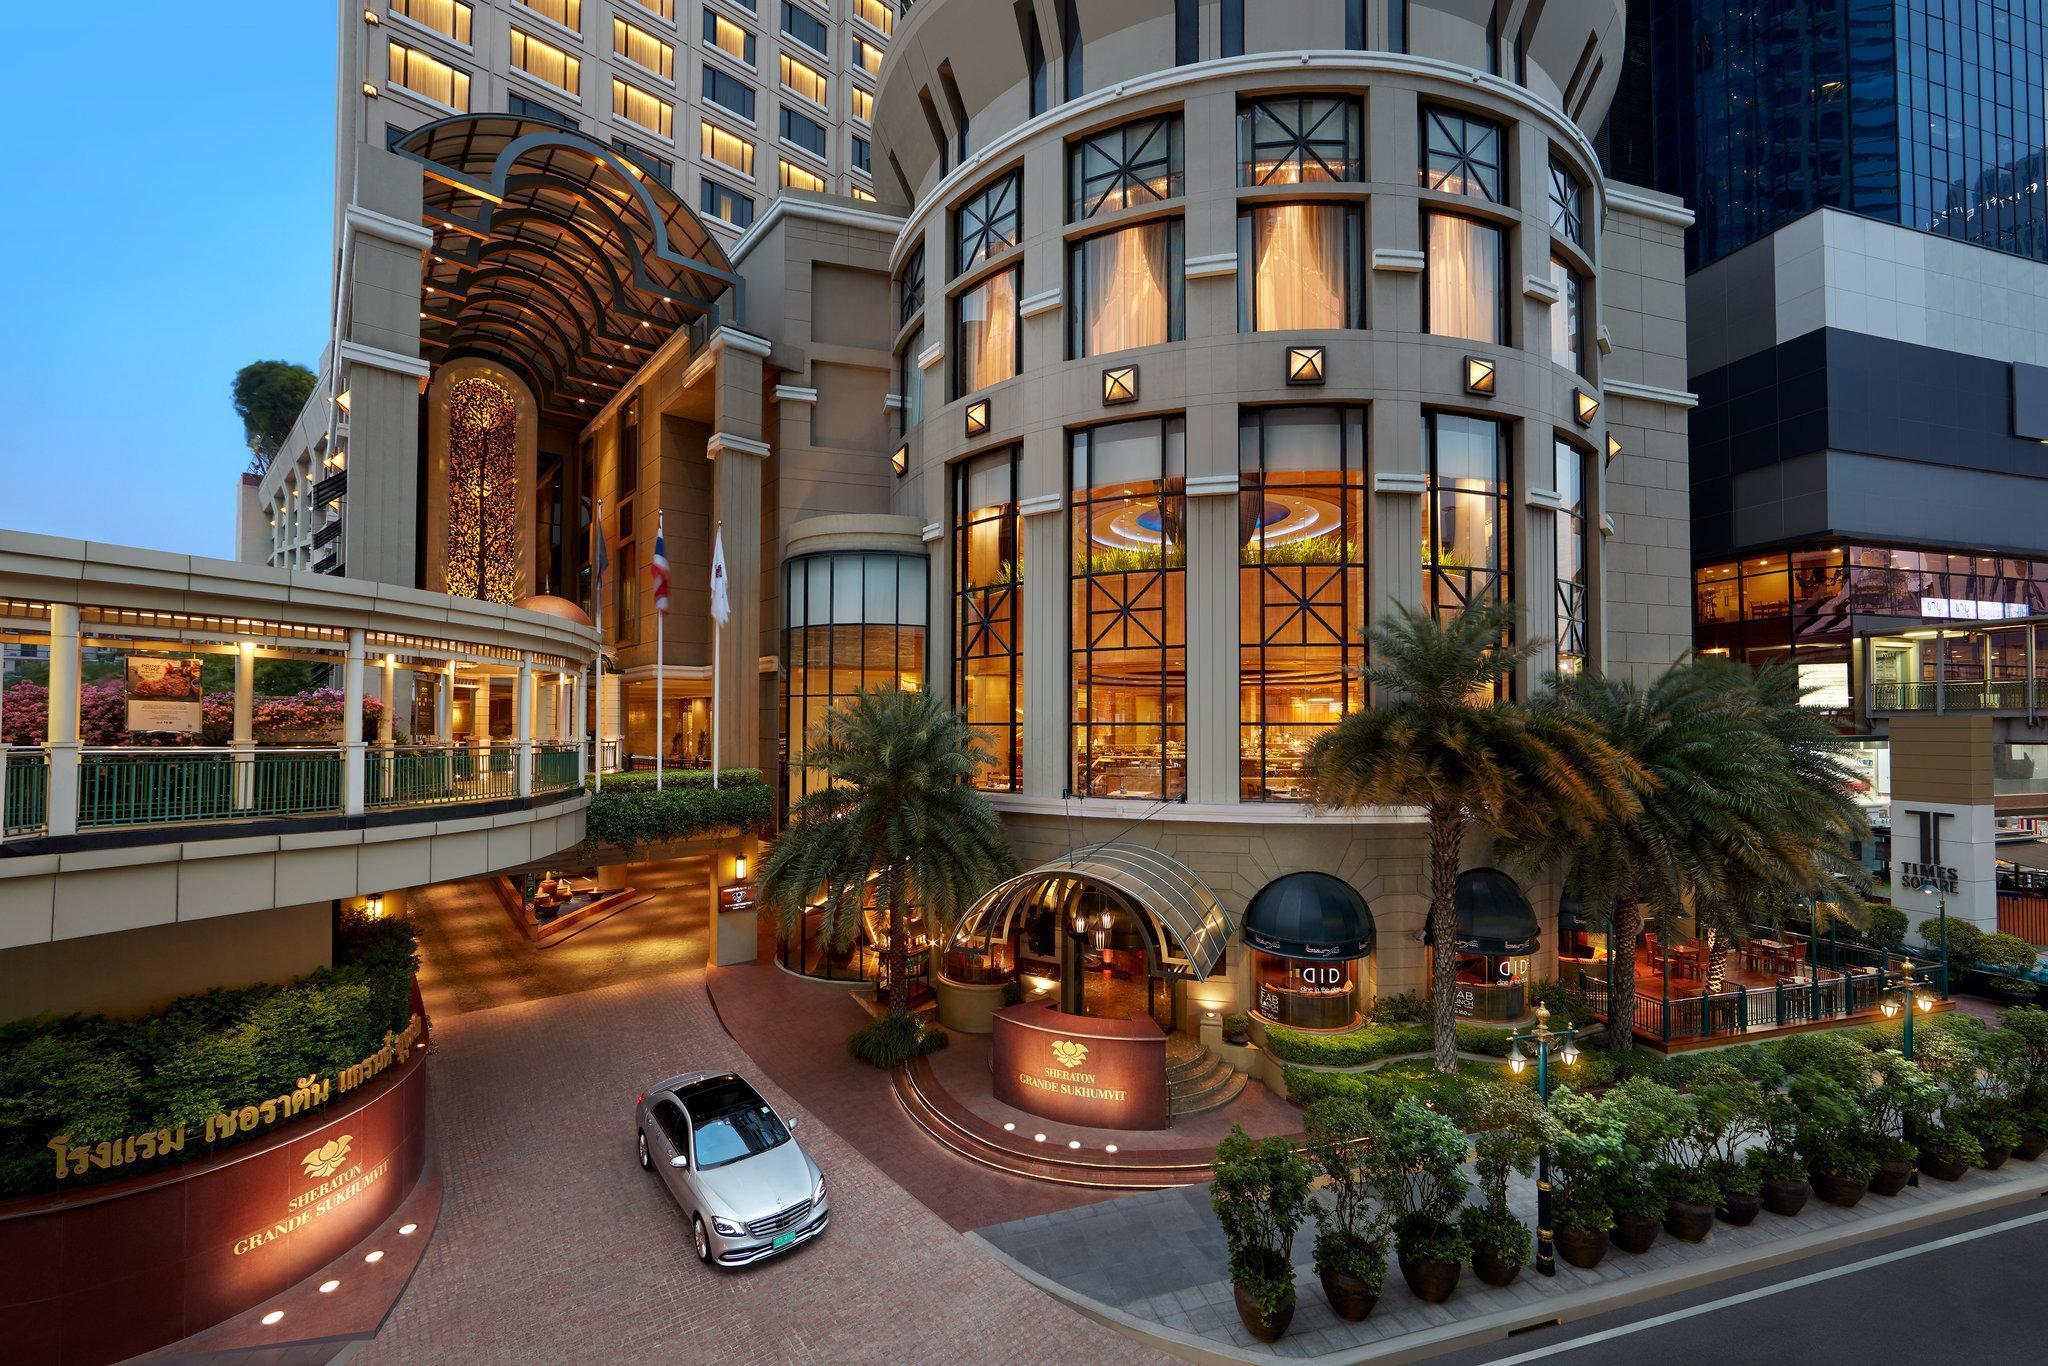 Sheraton Grande Sukhumvit, a Luxury Collection Hotel, Bangkok เชอราตัน แกรนด์ สุขุมวิท อะ ลักชัวรี คอลเลคชั่น โฮเต็ล กรุงเทพฯ